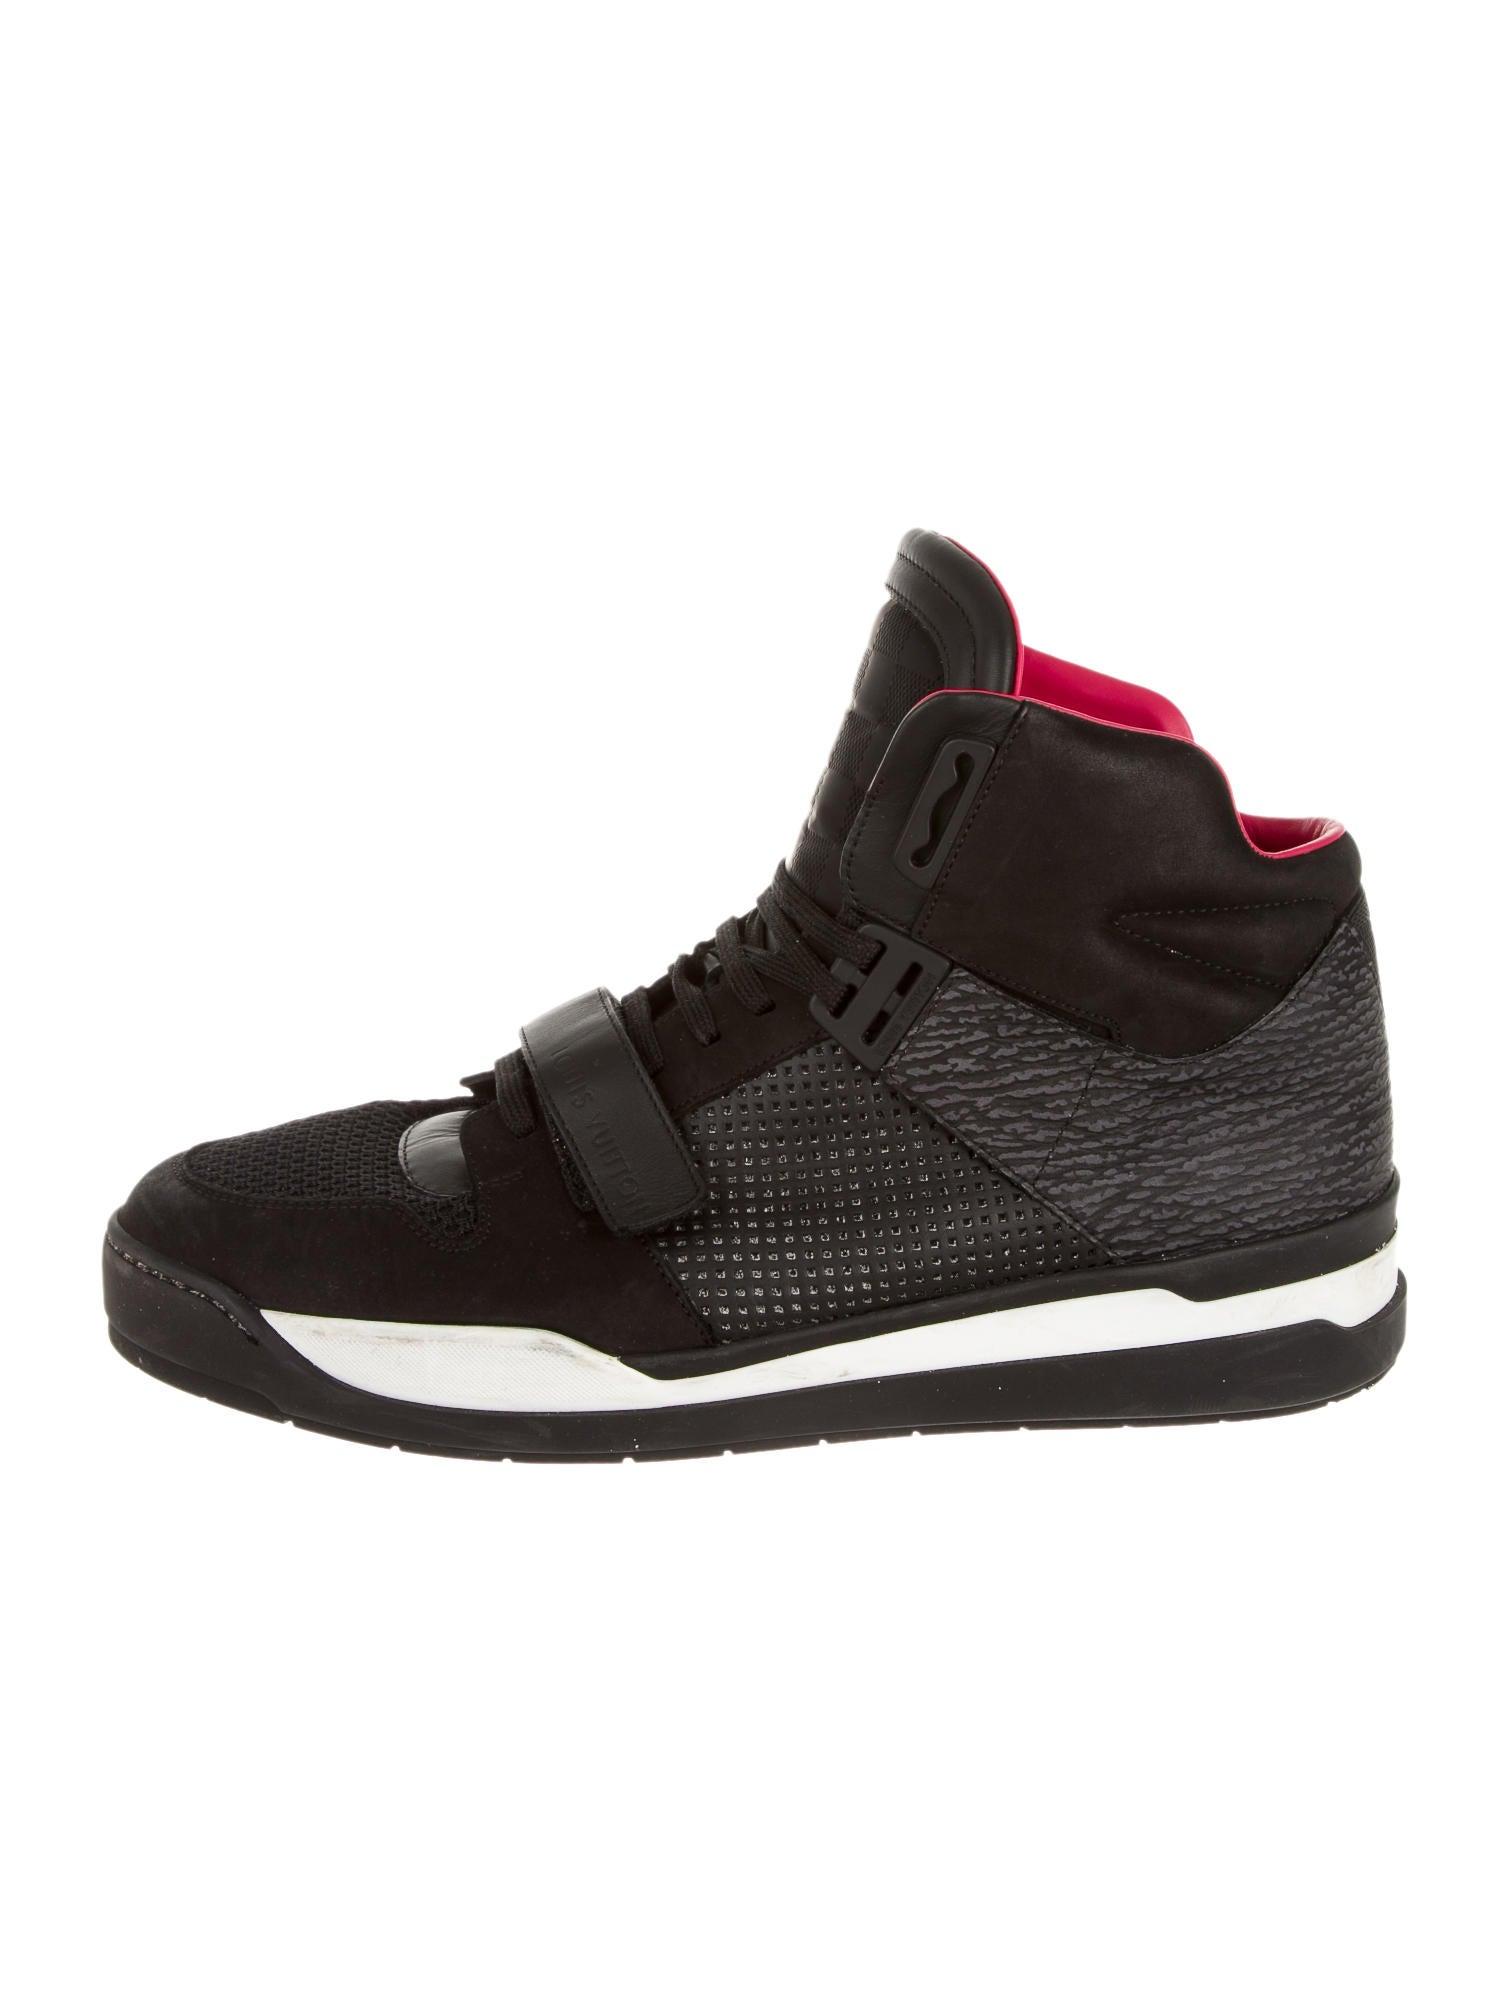 a848aad285b5 Louis Vuitton Trailblazer High-Top Sneakers - Shoes - LOU45332